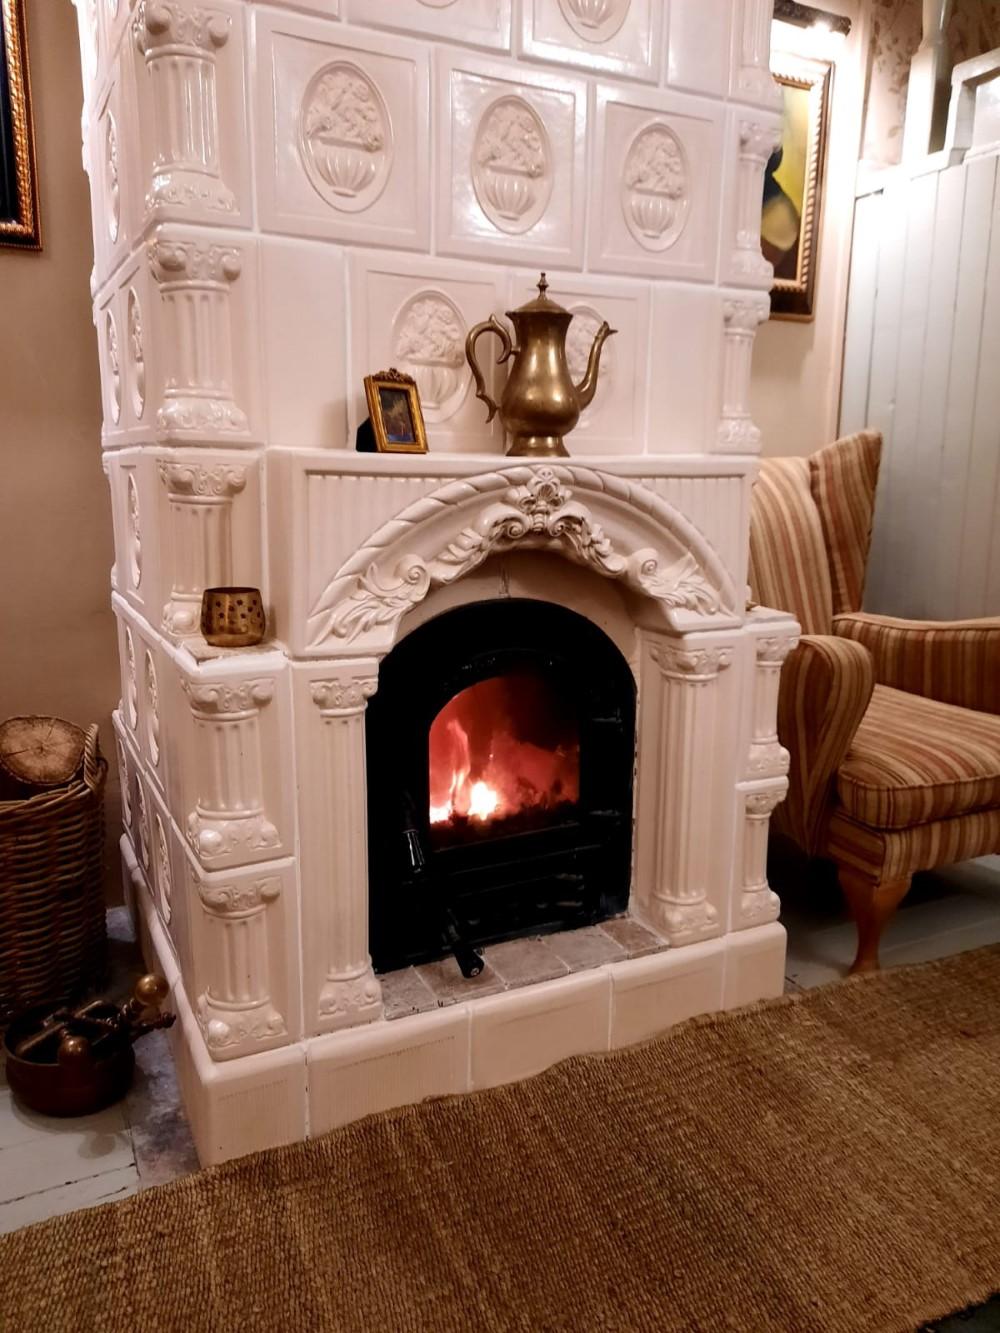 Soba de teracotă ține cald iarna